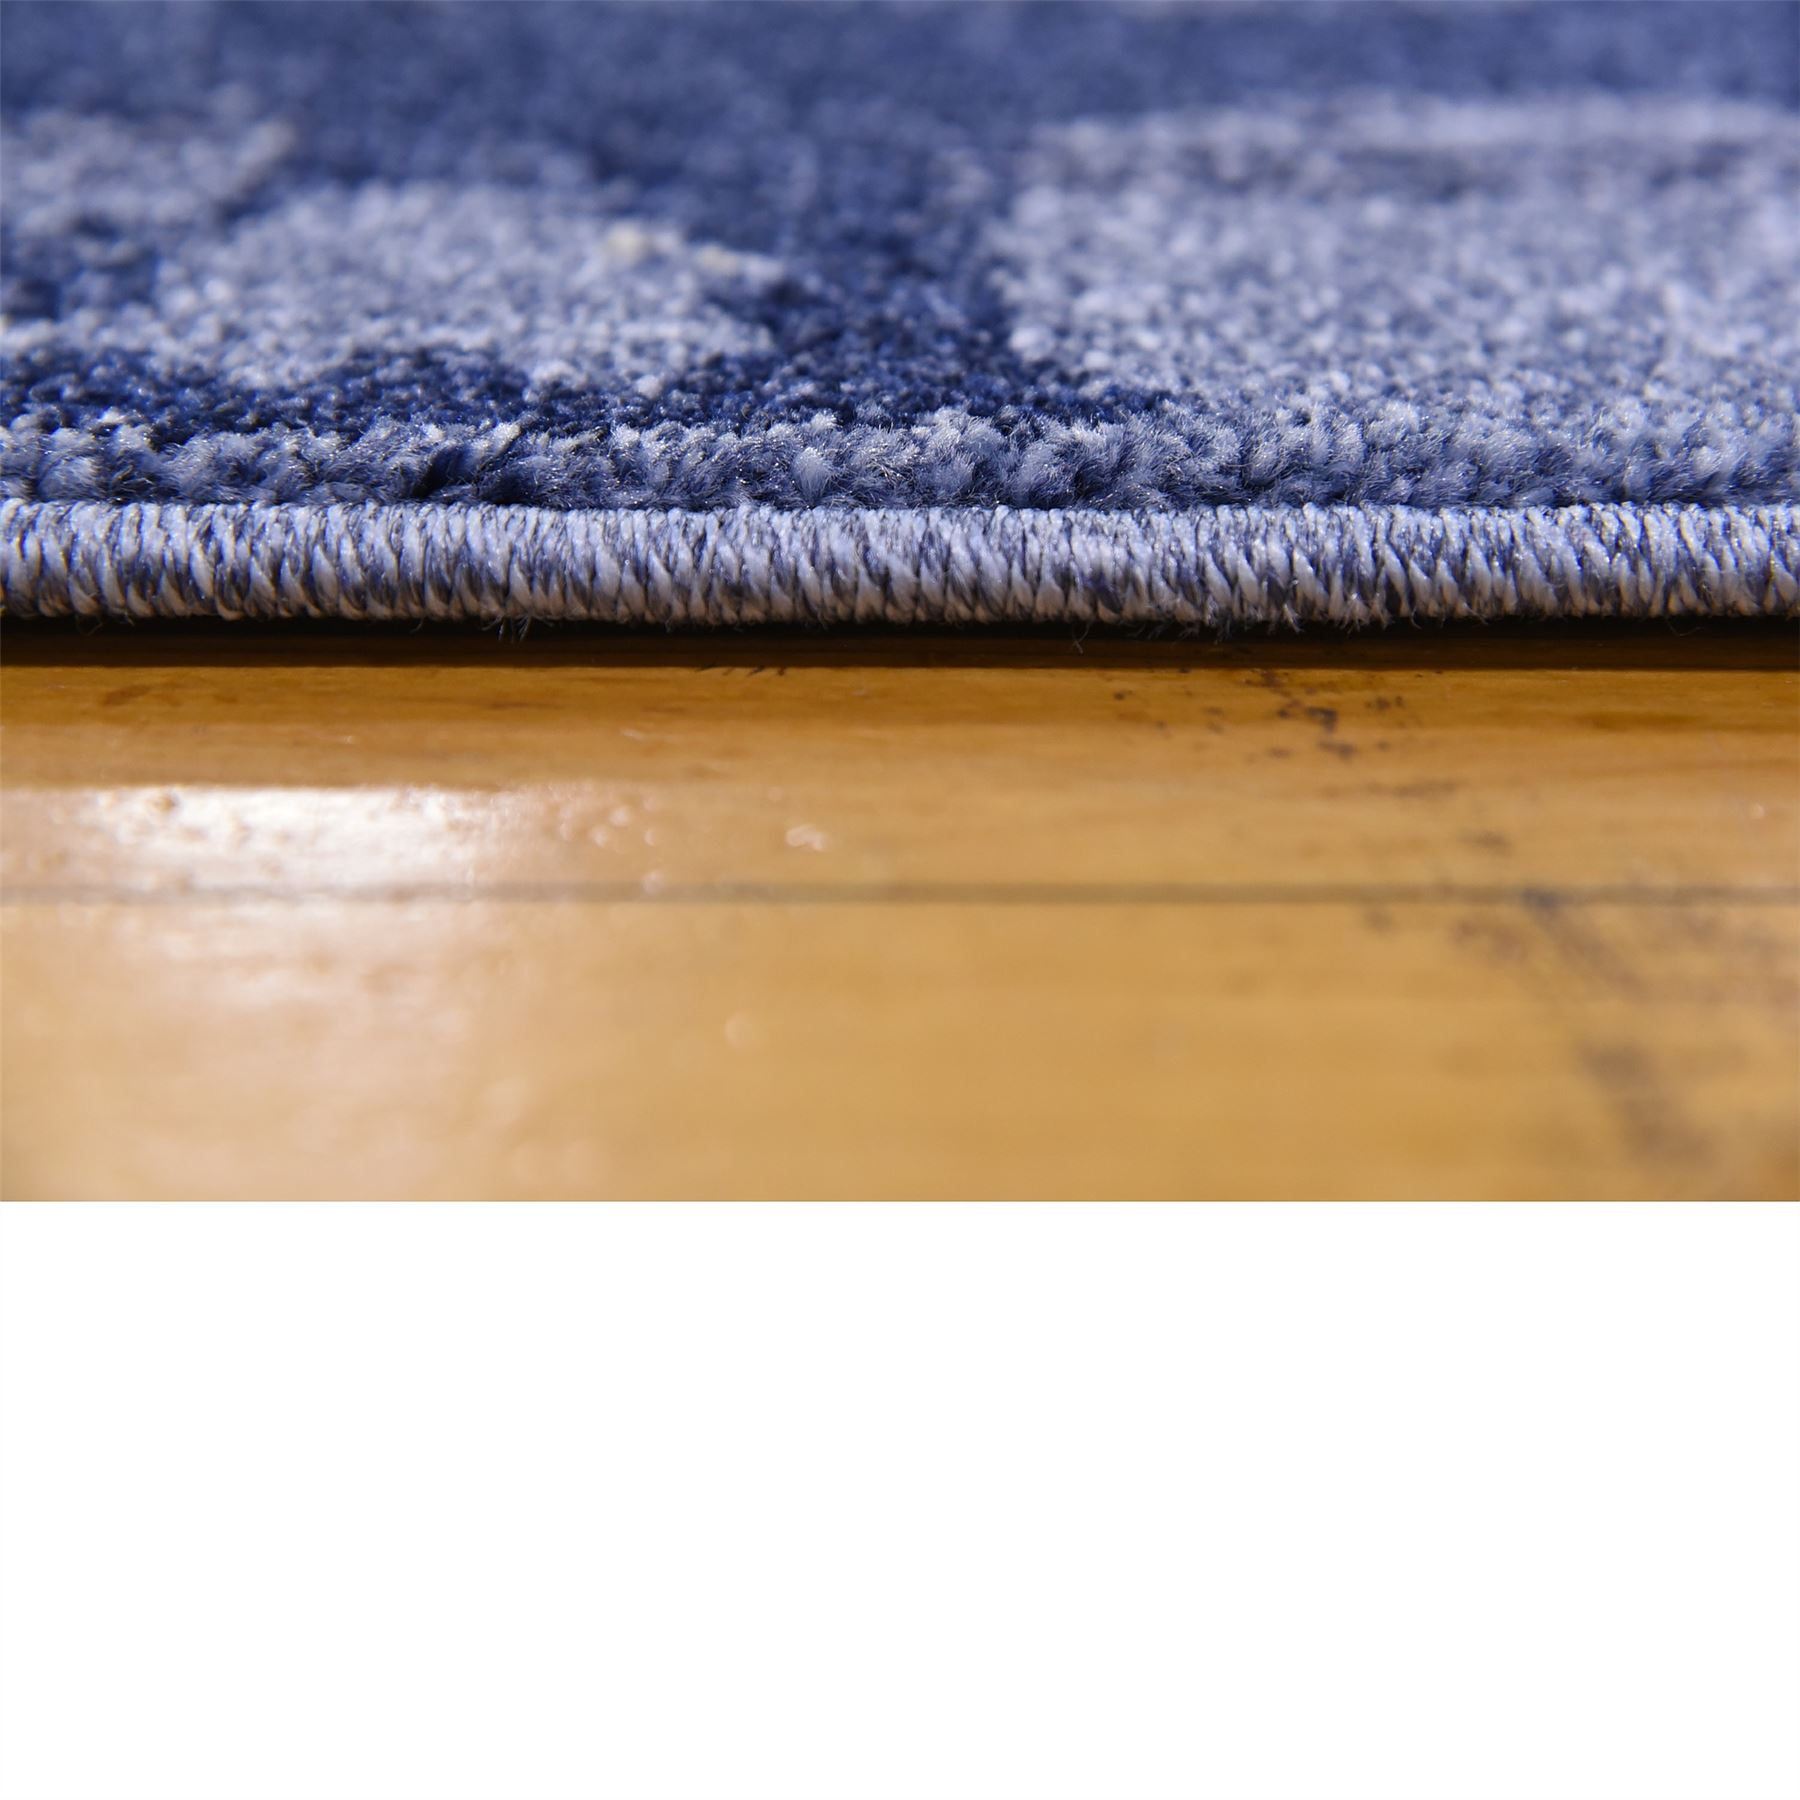 Persian Design Carpet Faded Vintage Style Area Rug